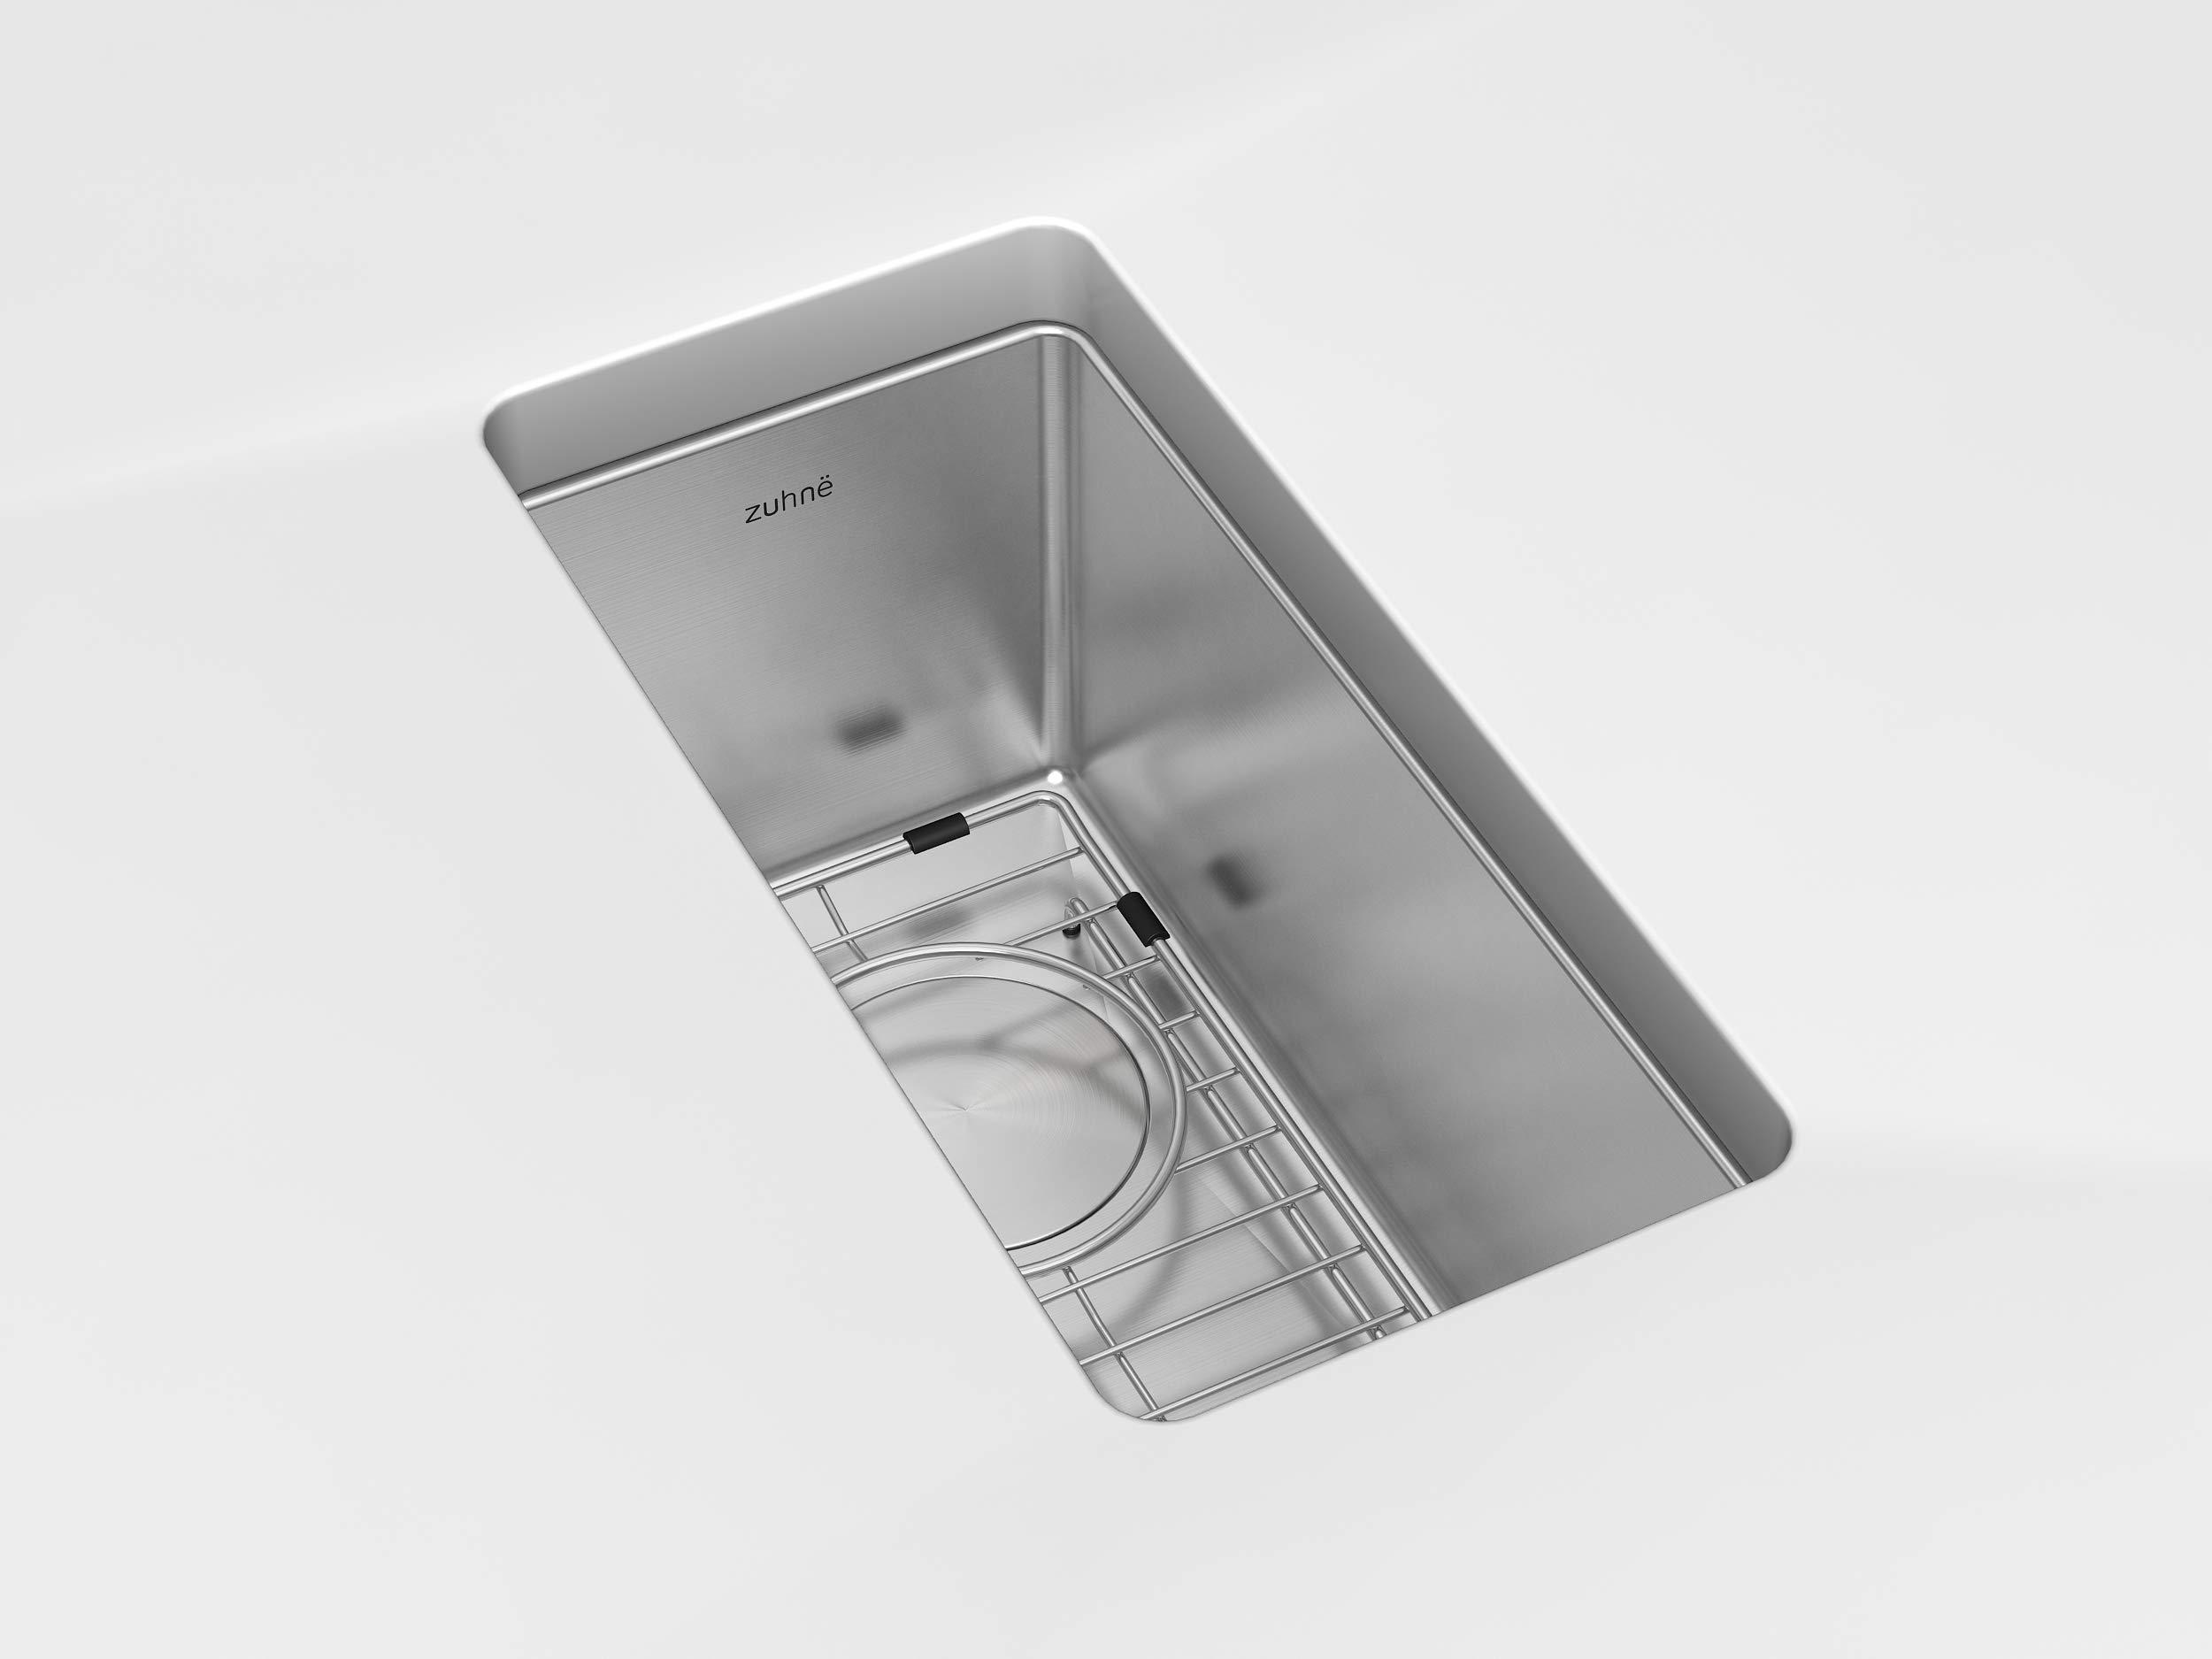 Zuhne Modena 10 x 18 Inch Undermount Single Bowl 16 Gauge Stainless Steel Bar or Prep Kitchen Sink by Zuhne (Image #2)